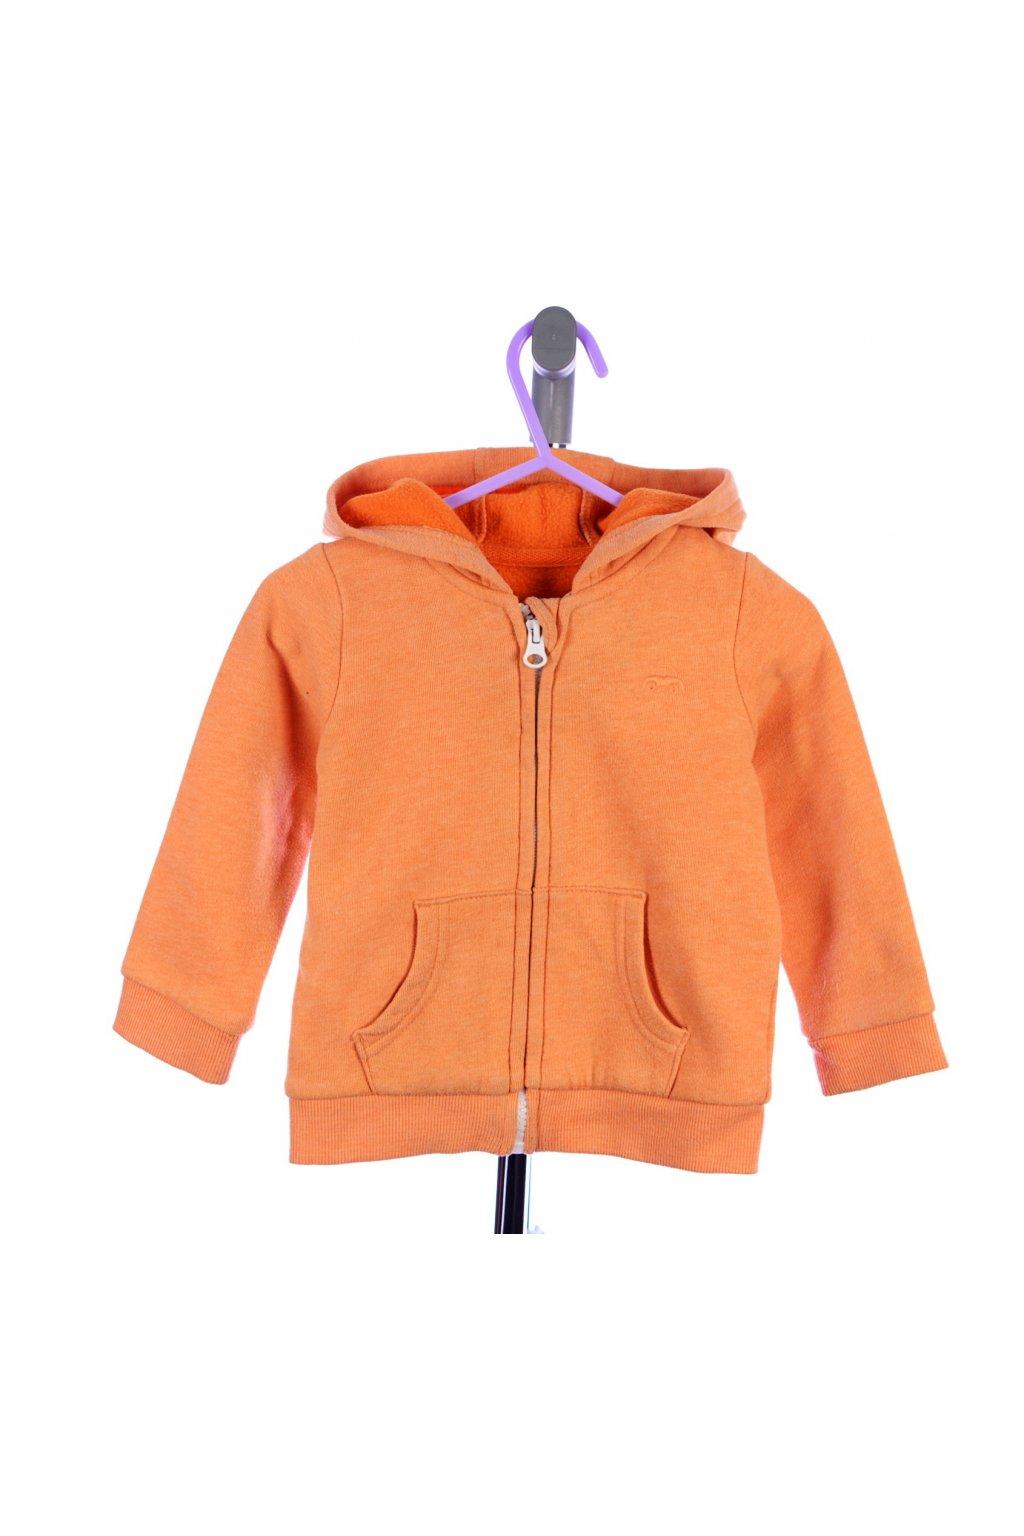 Mikina George 74-80 oranžová